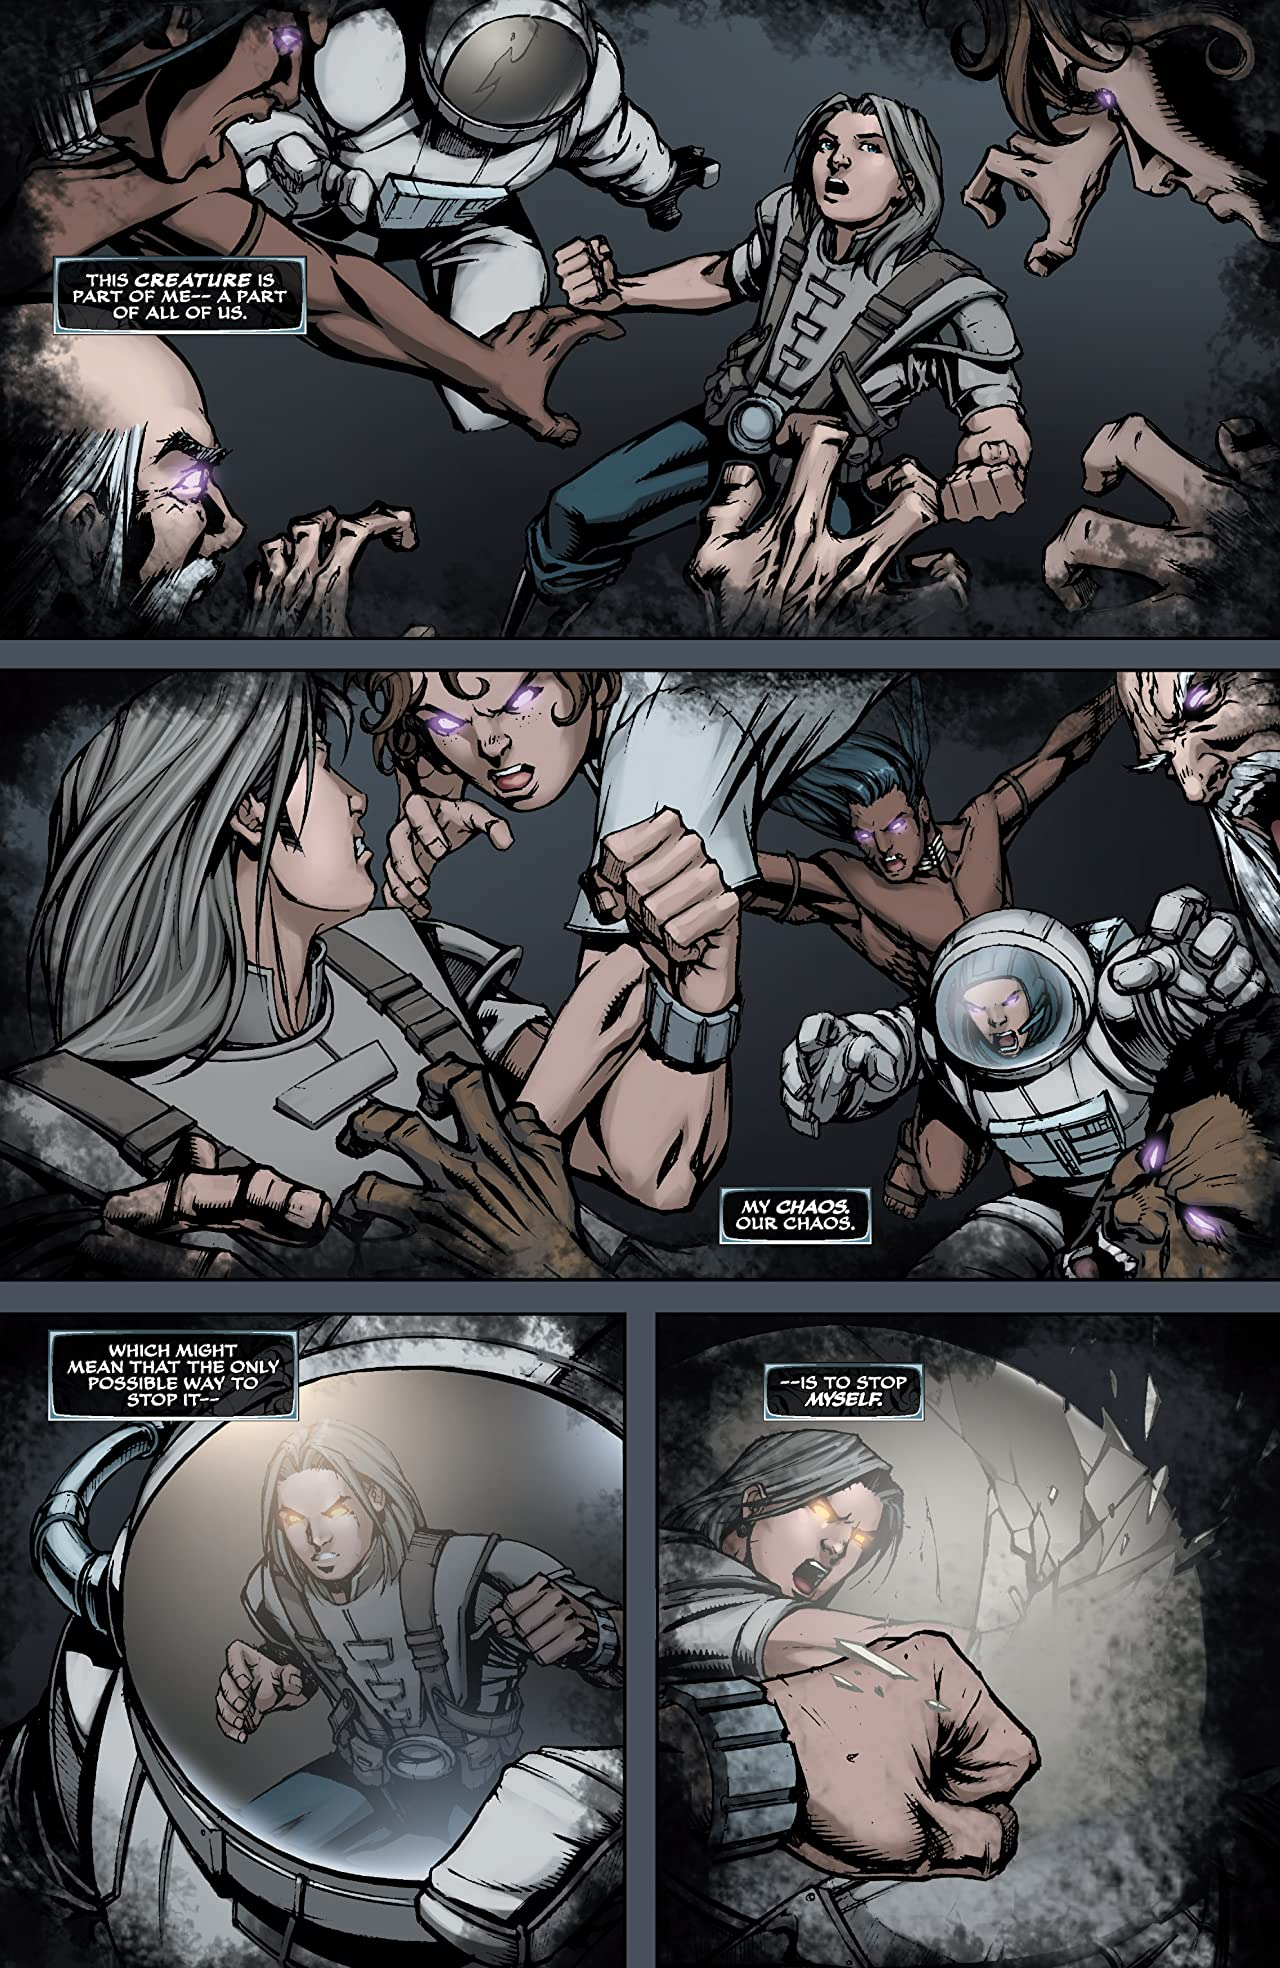 Soulfire Vol. 3 #8